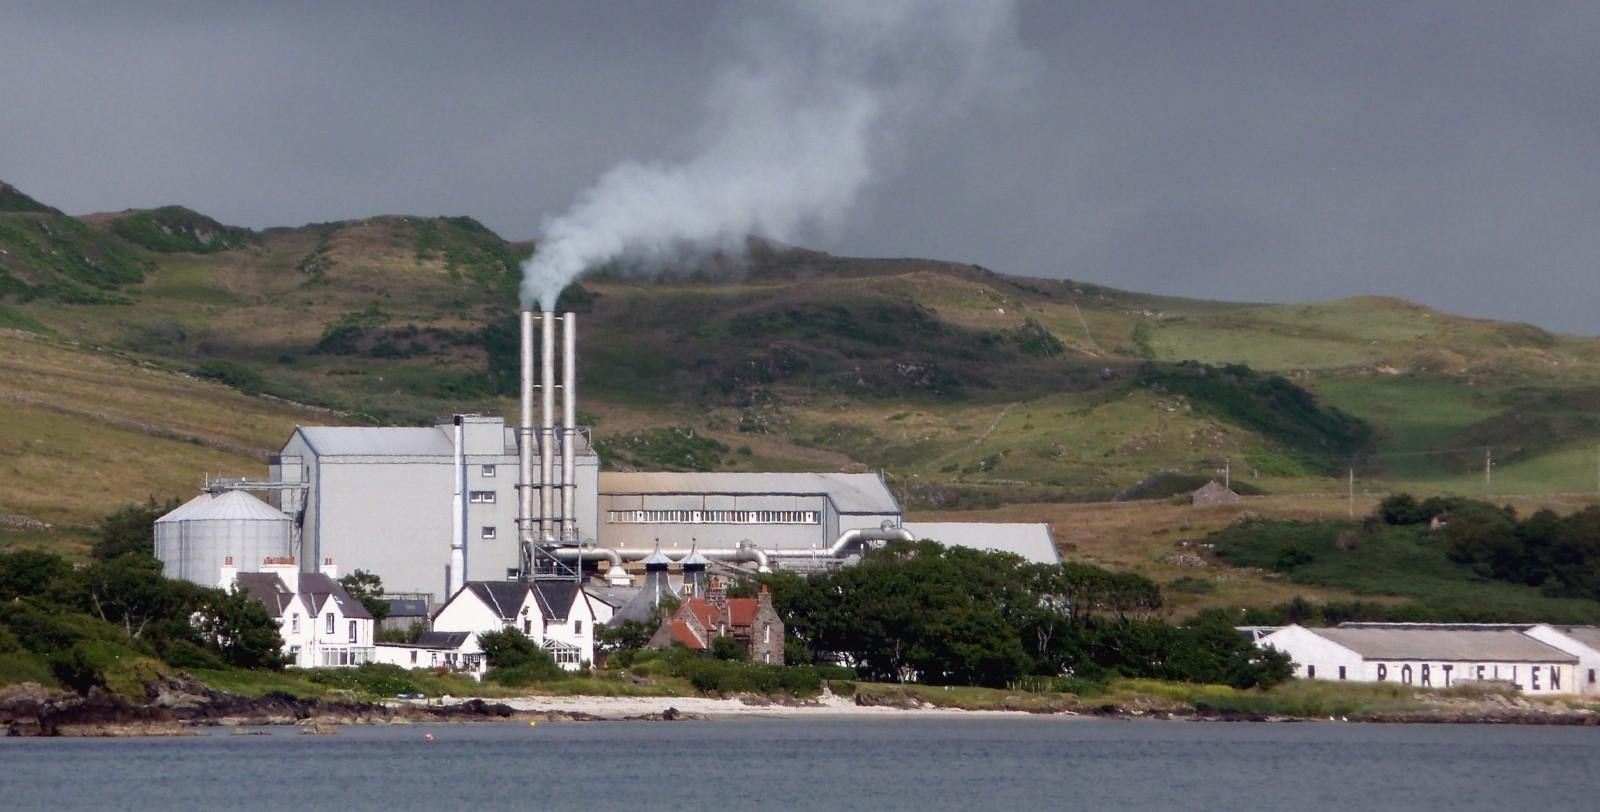 Port Ellen distillery - PHOTO: FLICKR/ Nigel Brown